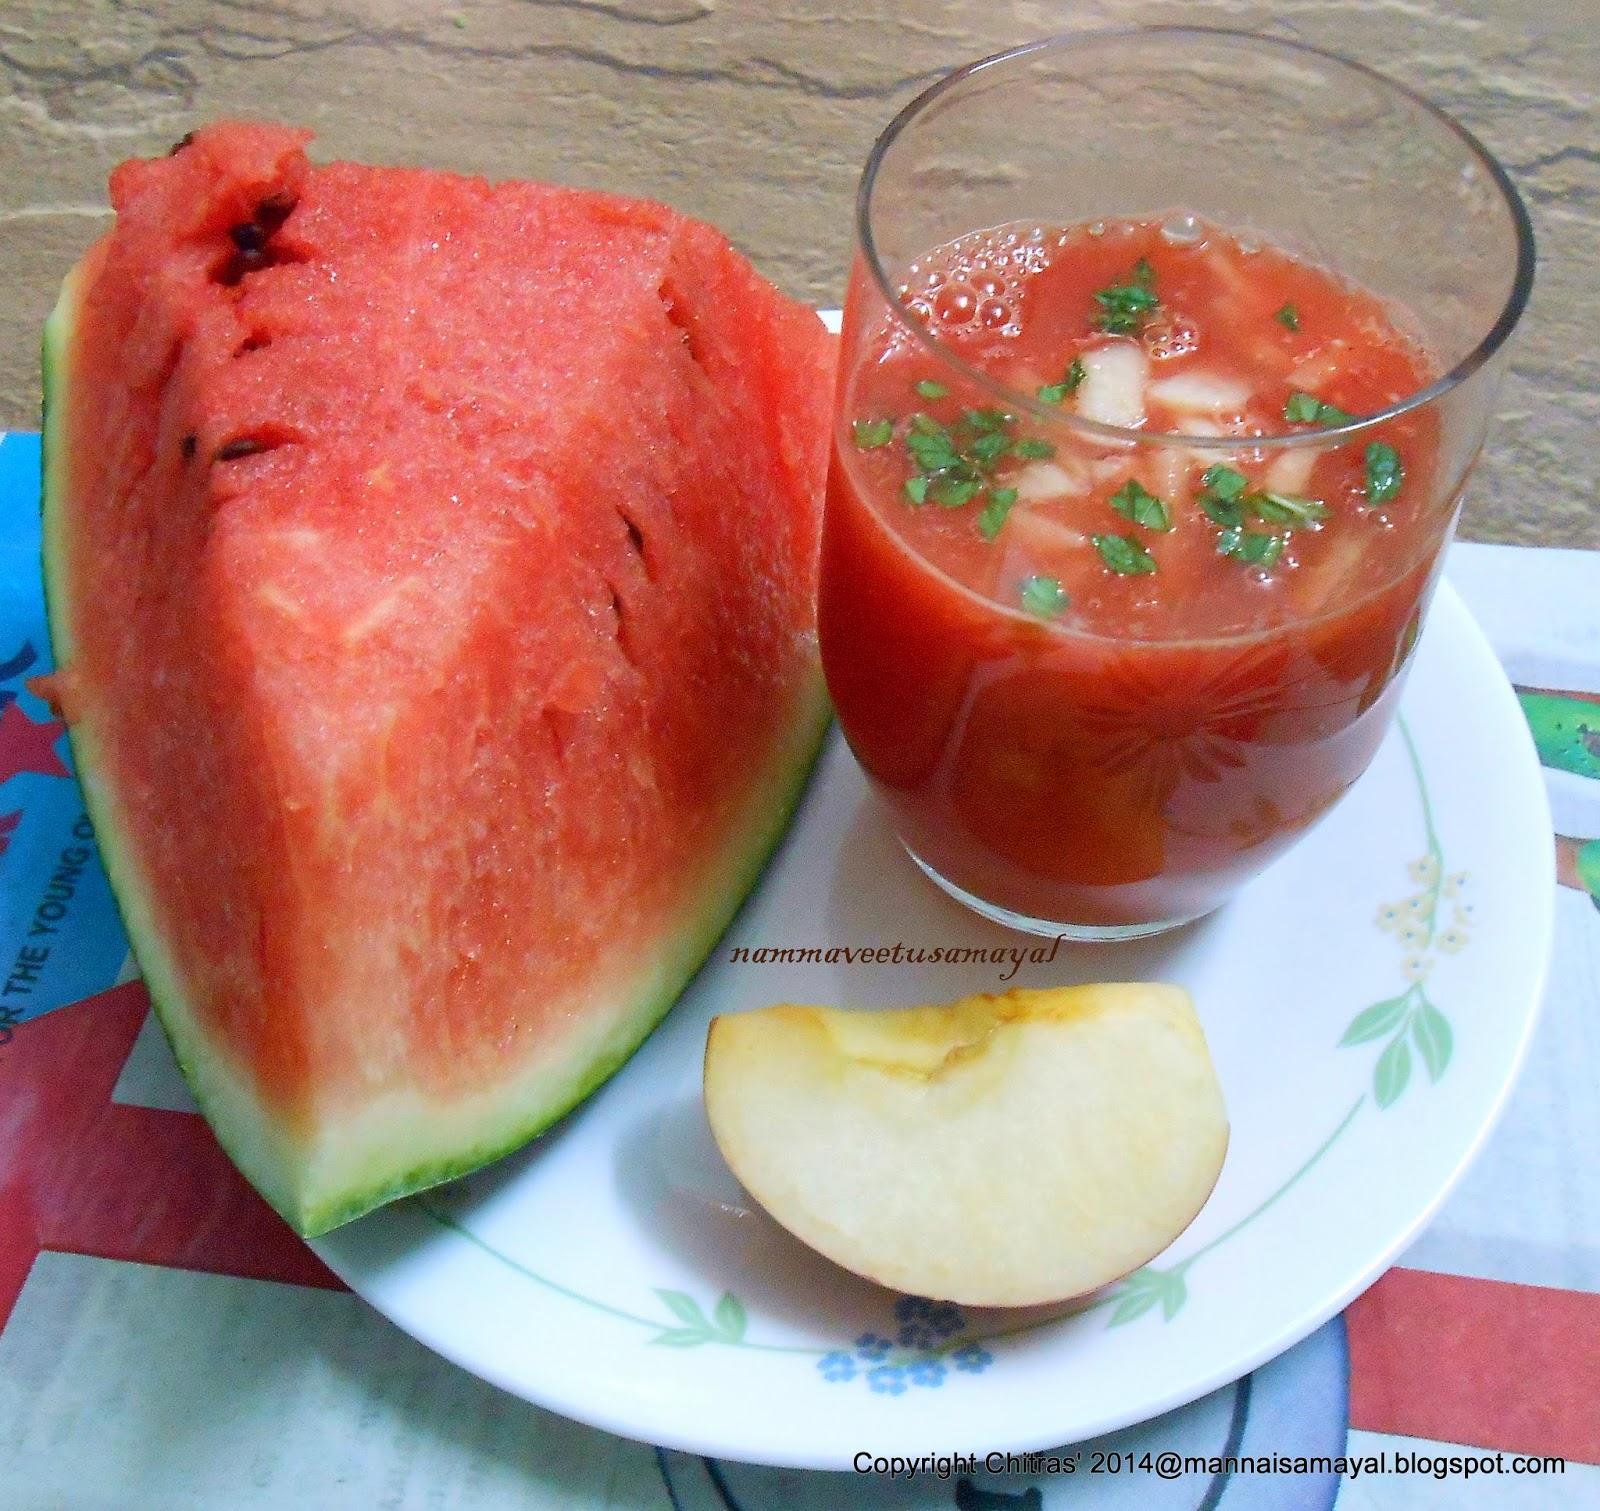 Watermelon orange juice